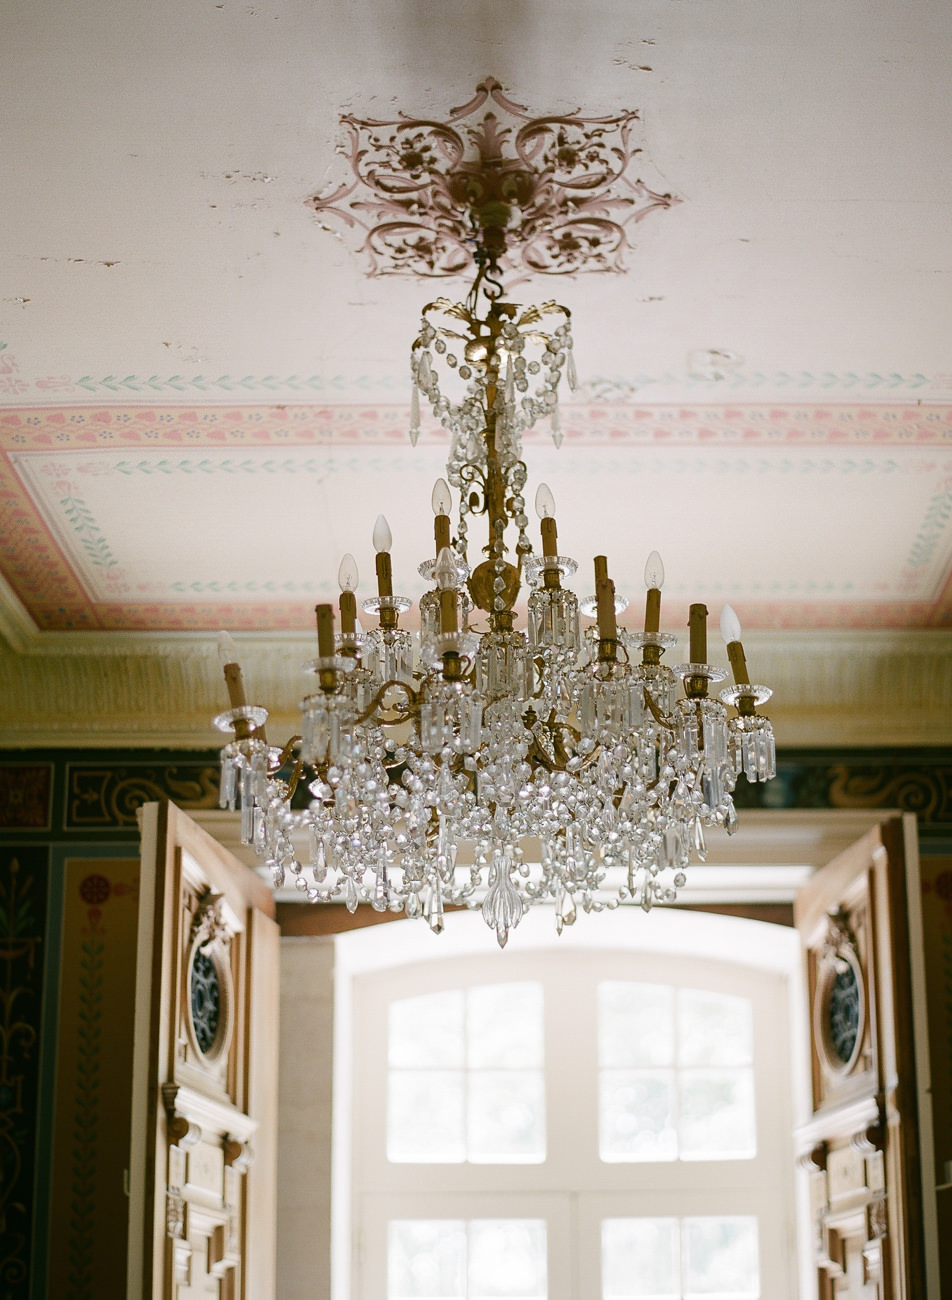 chateau-valmousse-photographe-mariage-alain-m-8.jpg